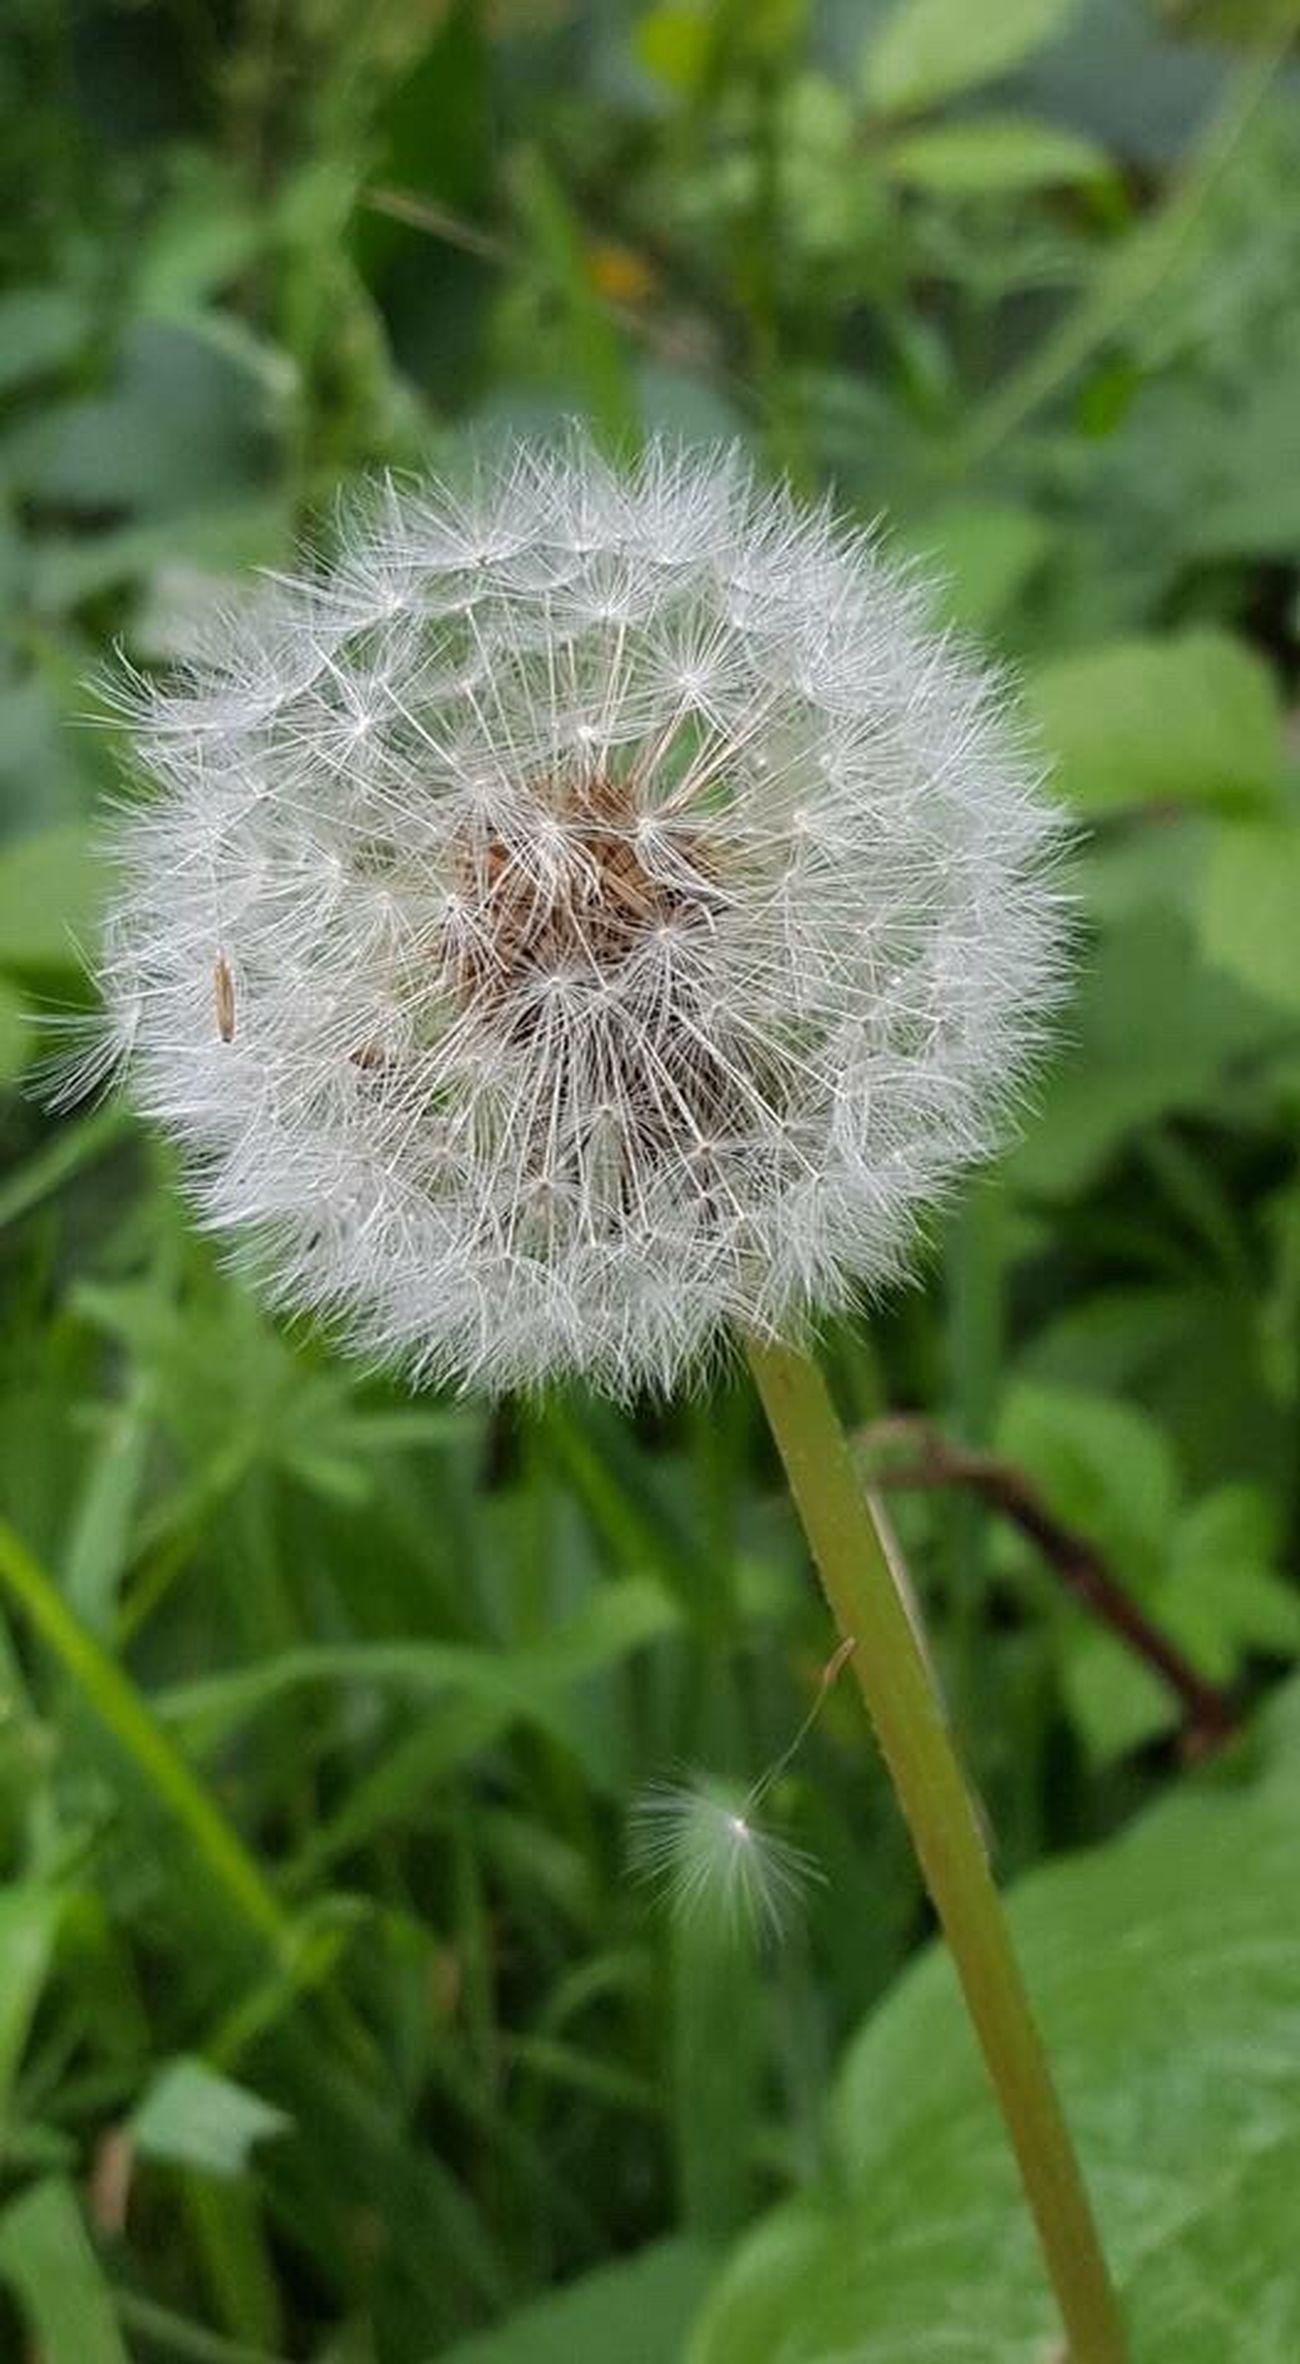 Make a wish! EyeEm Best Shots ATouristInMyOwnCity TheSidewalksOfTheCity ScenesFromTheStreet